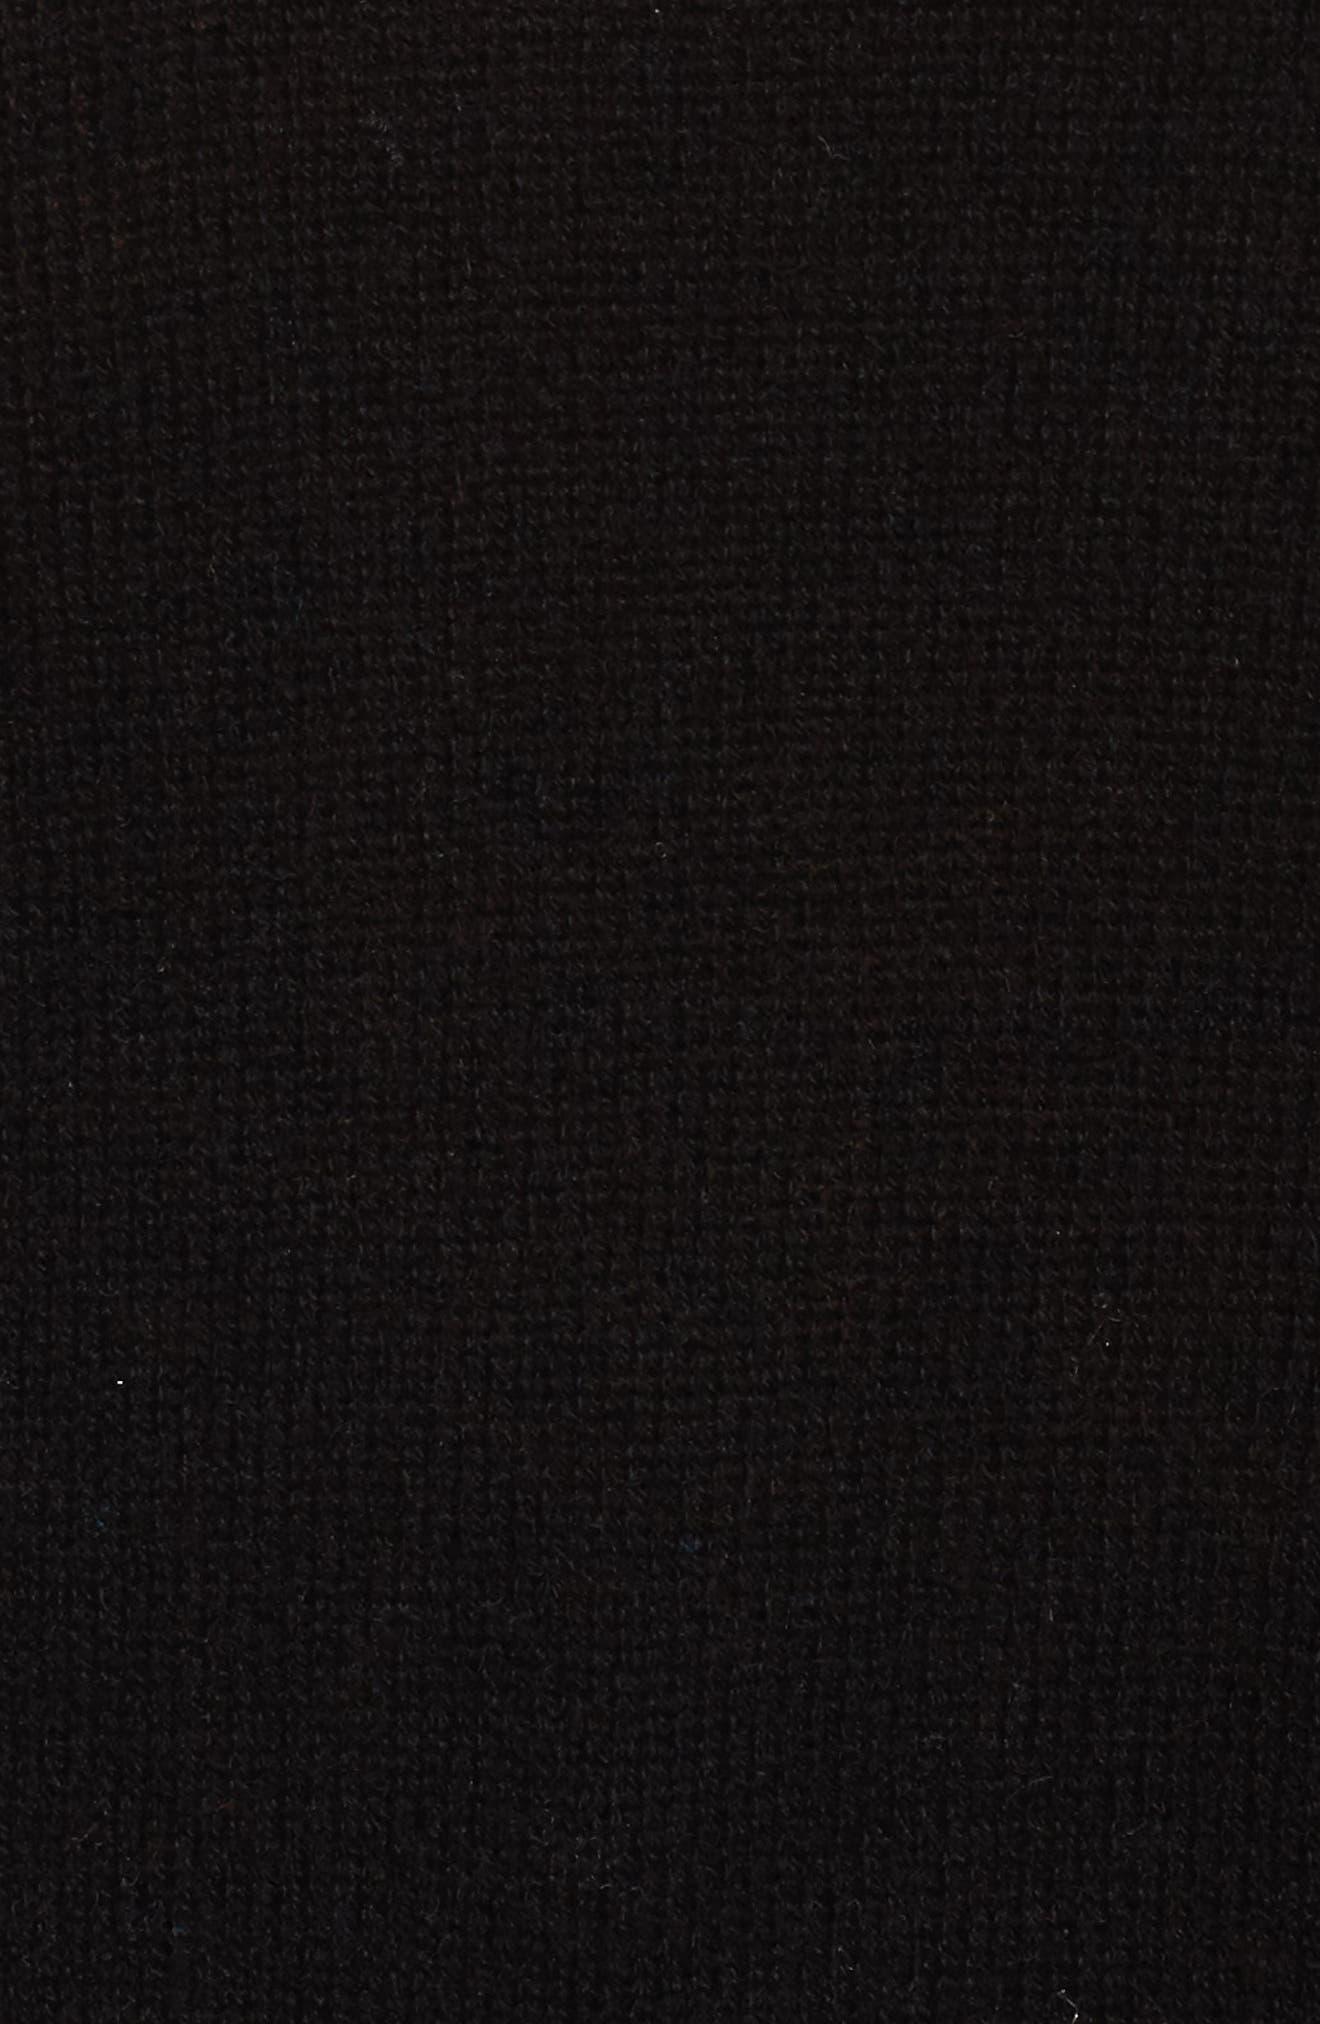 Crewneck Side Split Wool & Cashmere Pullover,                             Alternate thumbnail 5, color,                             001